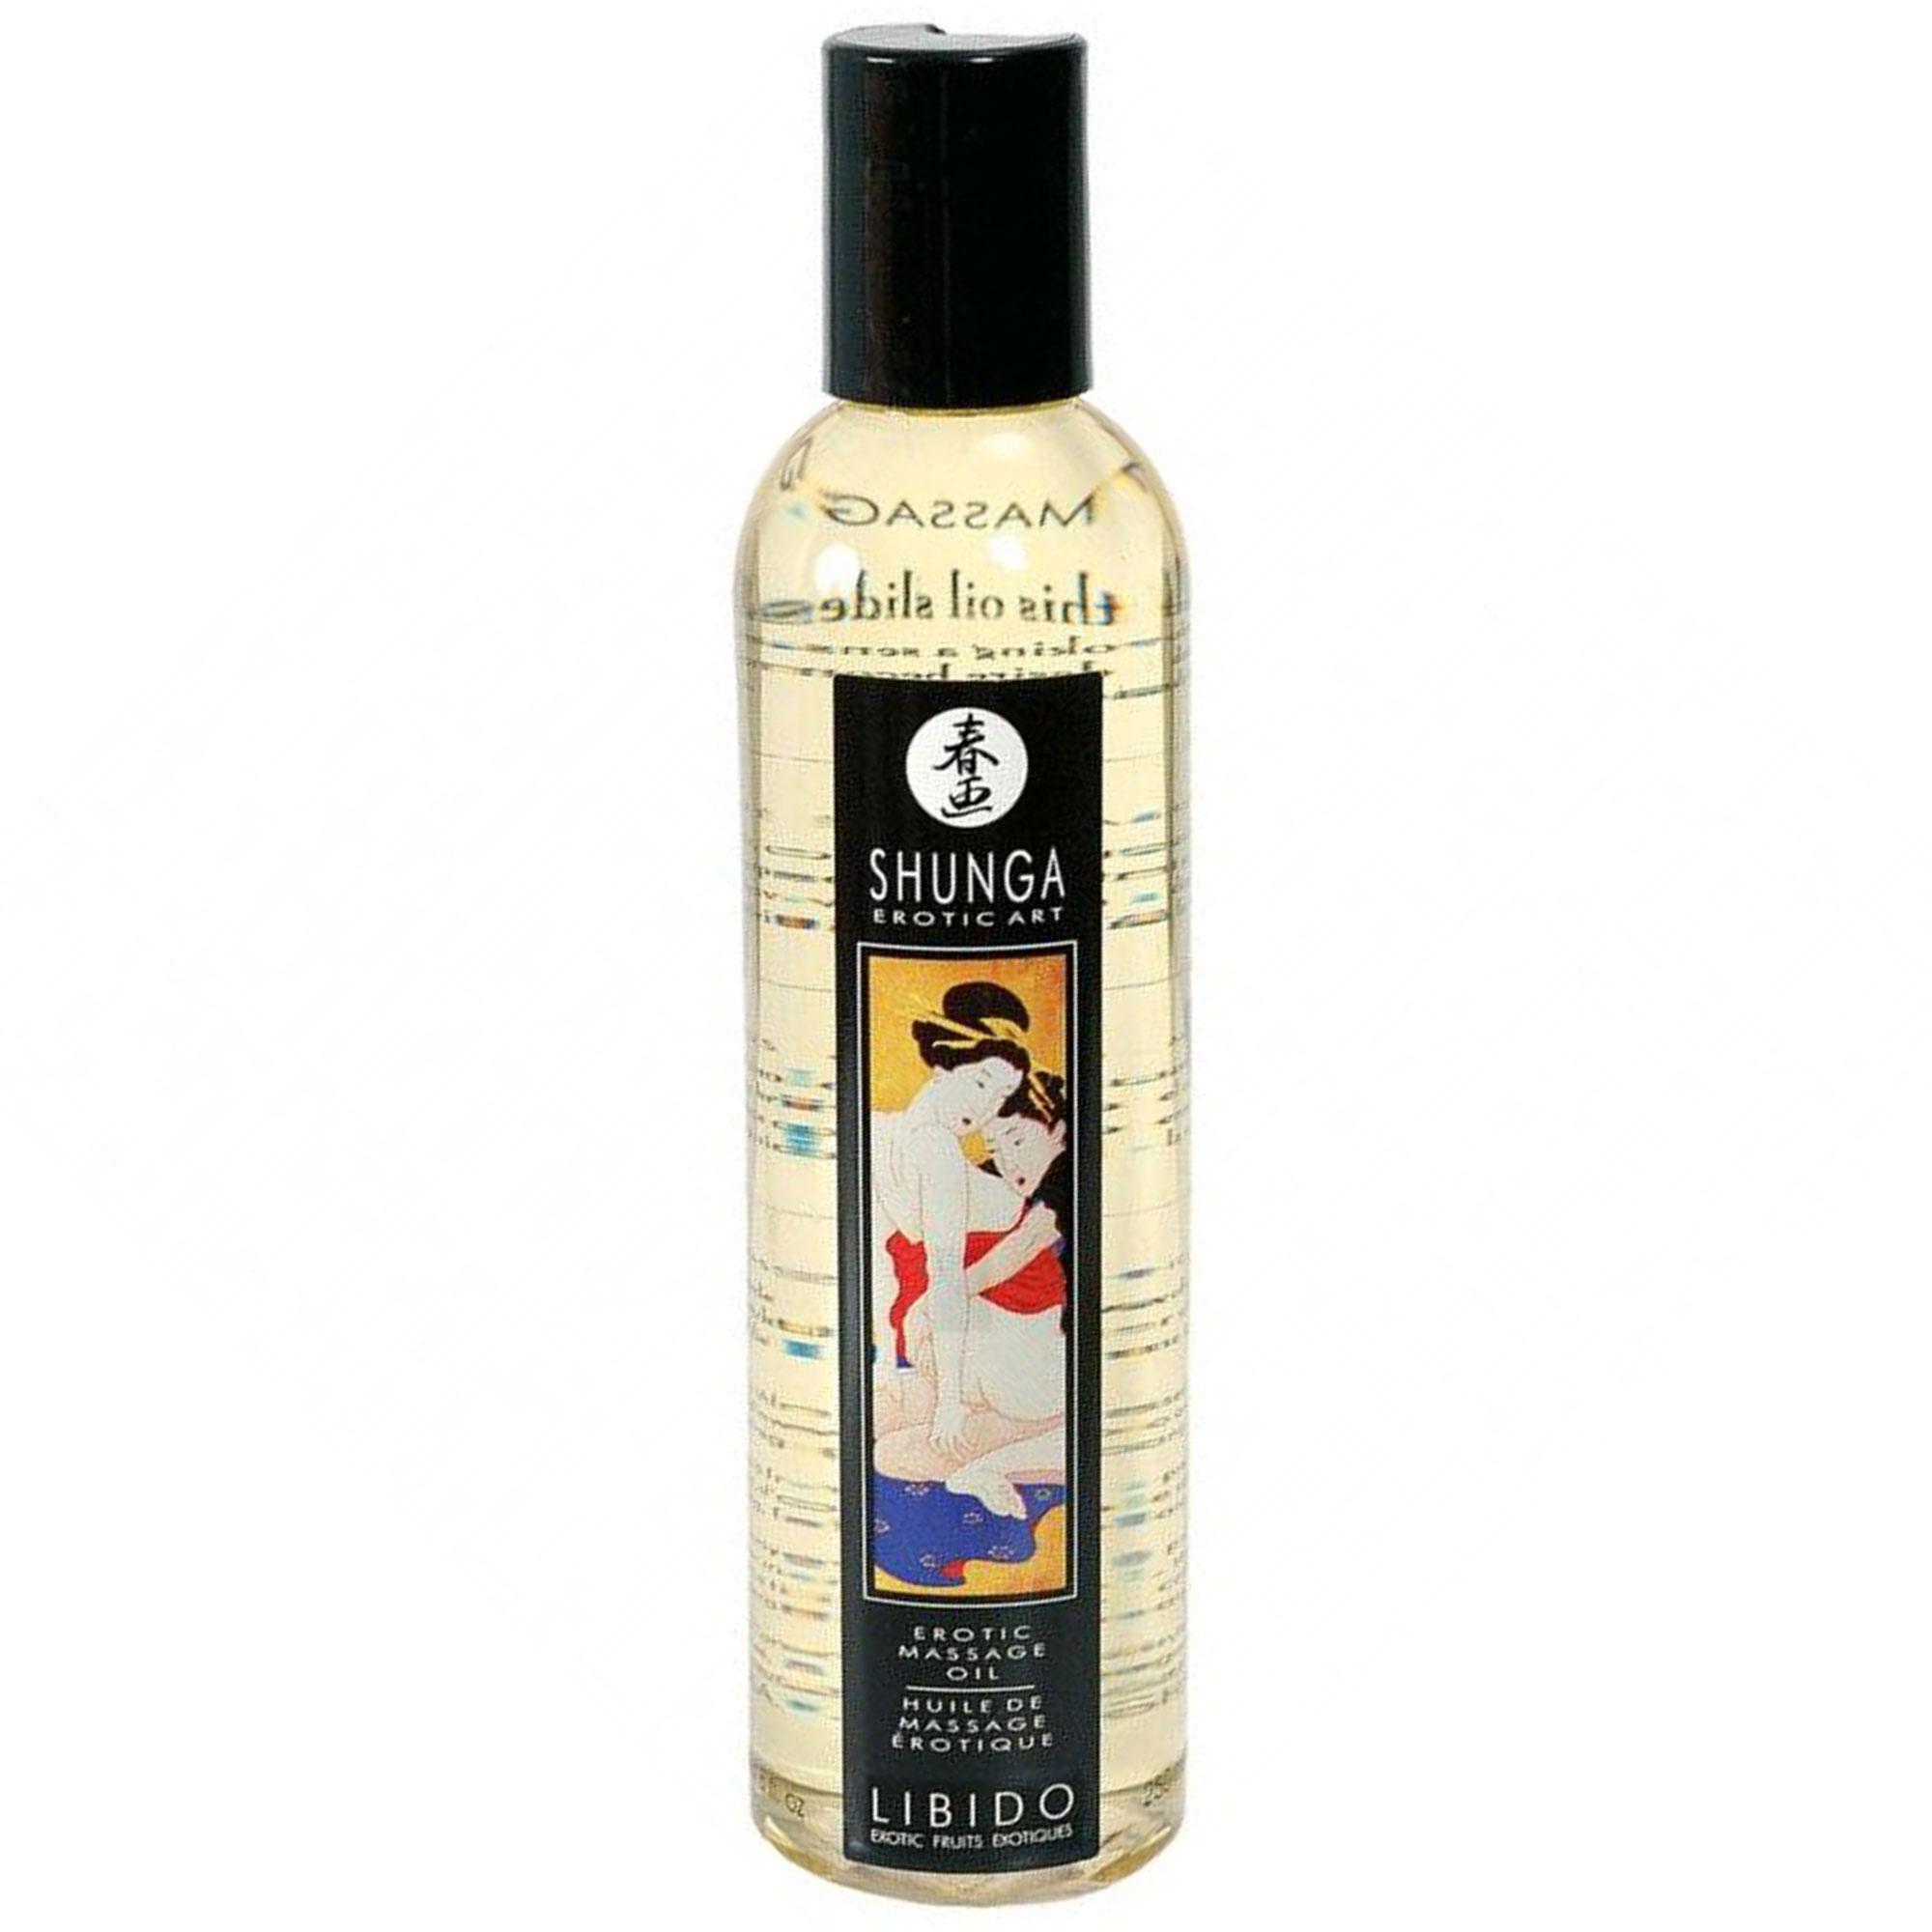 Shunga Massage Oil Libido - 250 ml | Apotek, Massage, Massageolja | Intimast.se - Sexleksaker